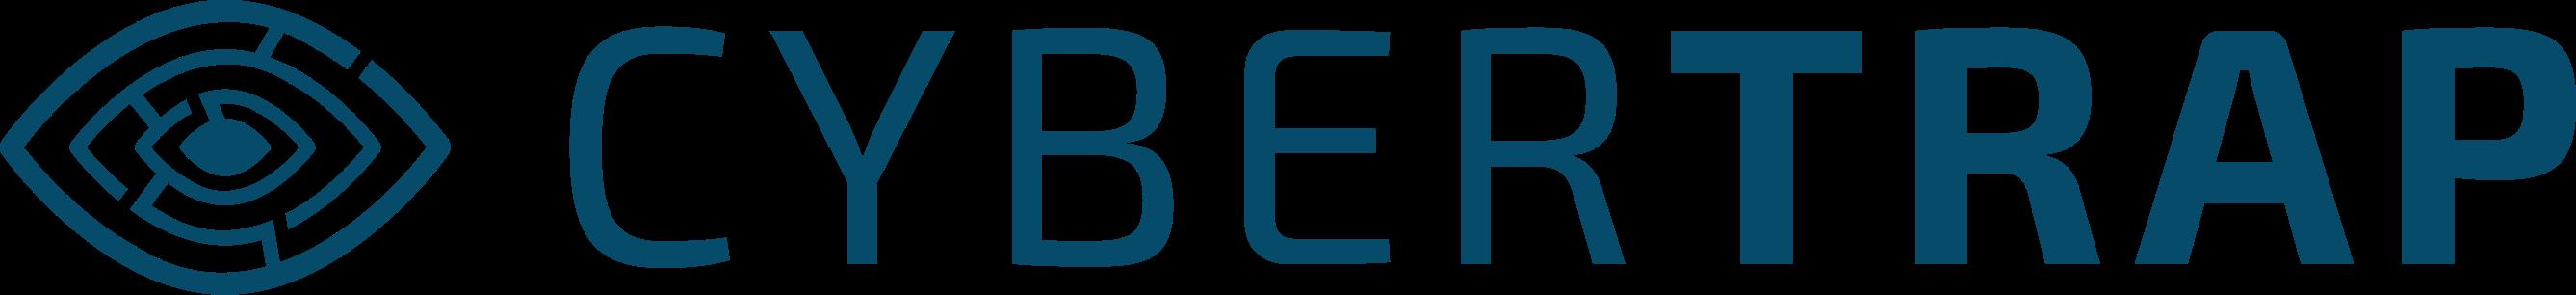 CyberTrap logo